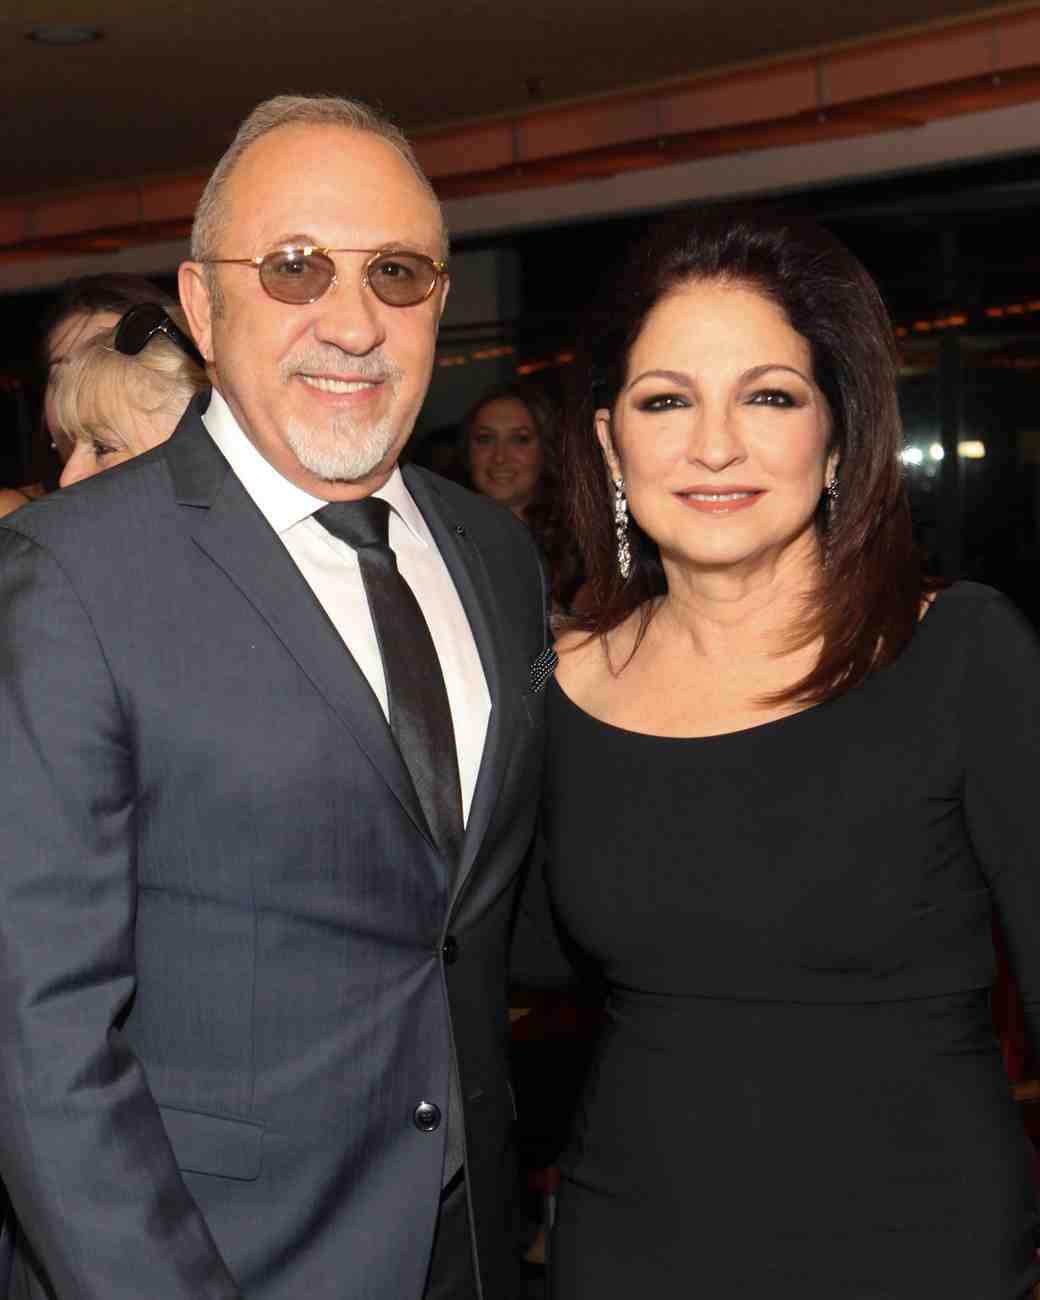 gloria-estefan-emilio-estefan-iconic-hollywood-couples-0216.jpg